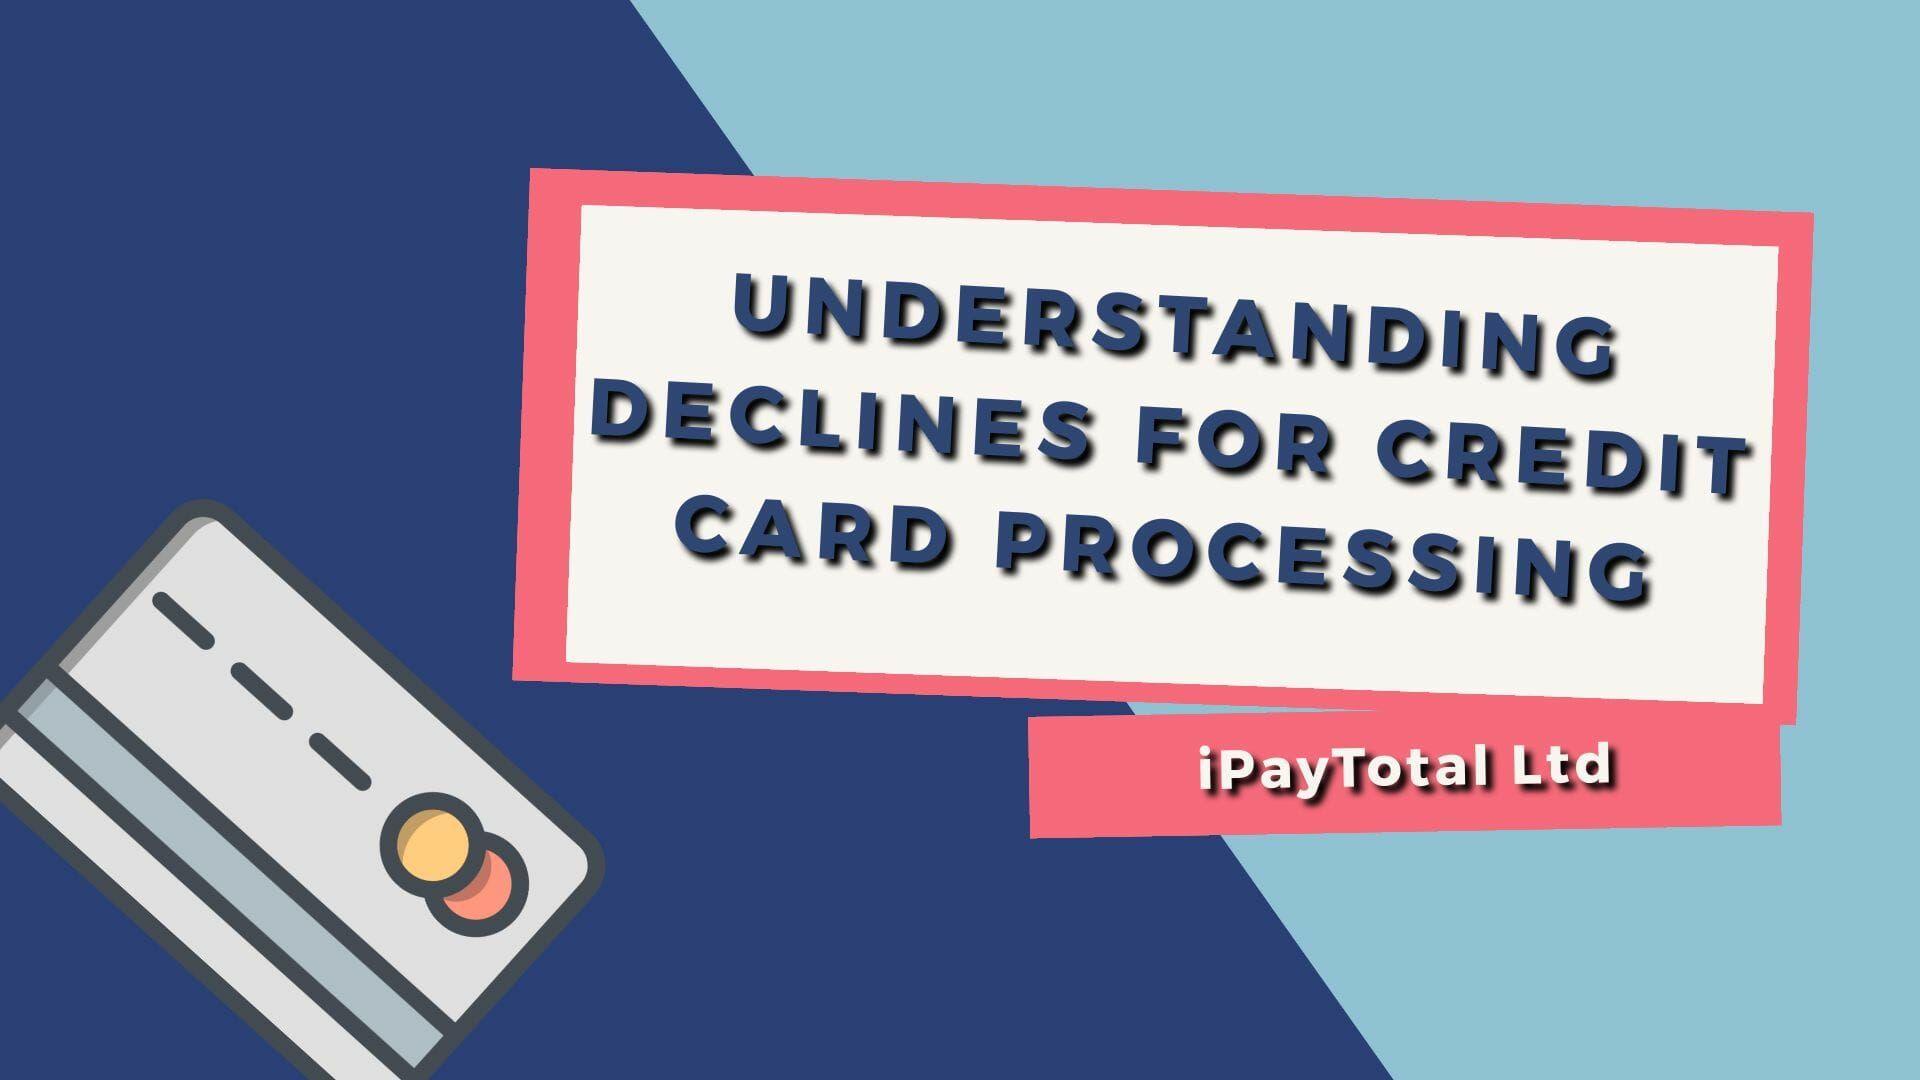 Blog Ipaytotal Ltd Credit Card Processing Blog Grow Business